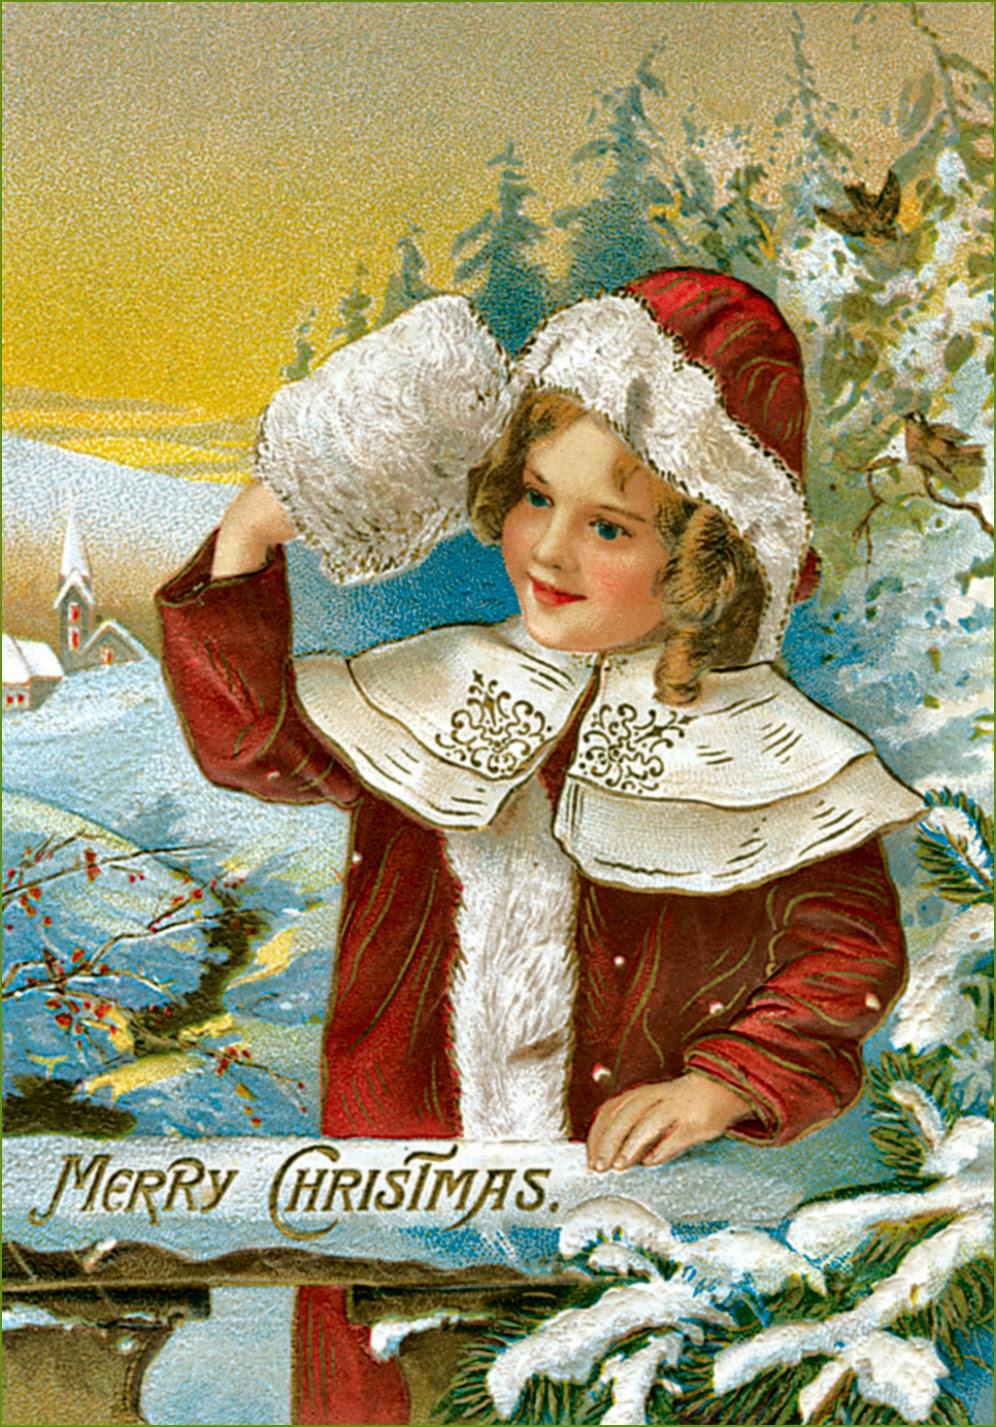 Vintage Ephemera: Victorian Christmas Card